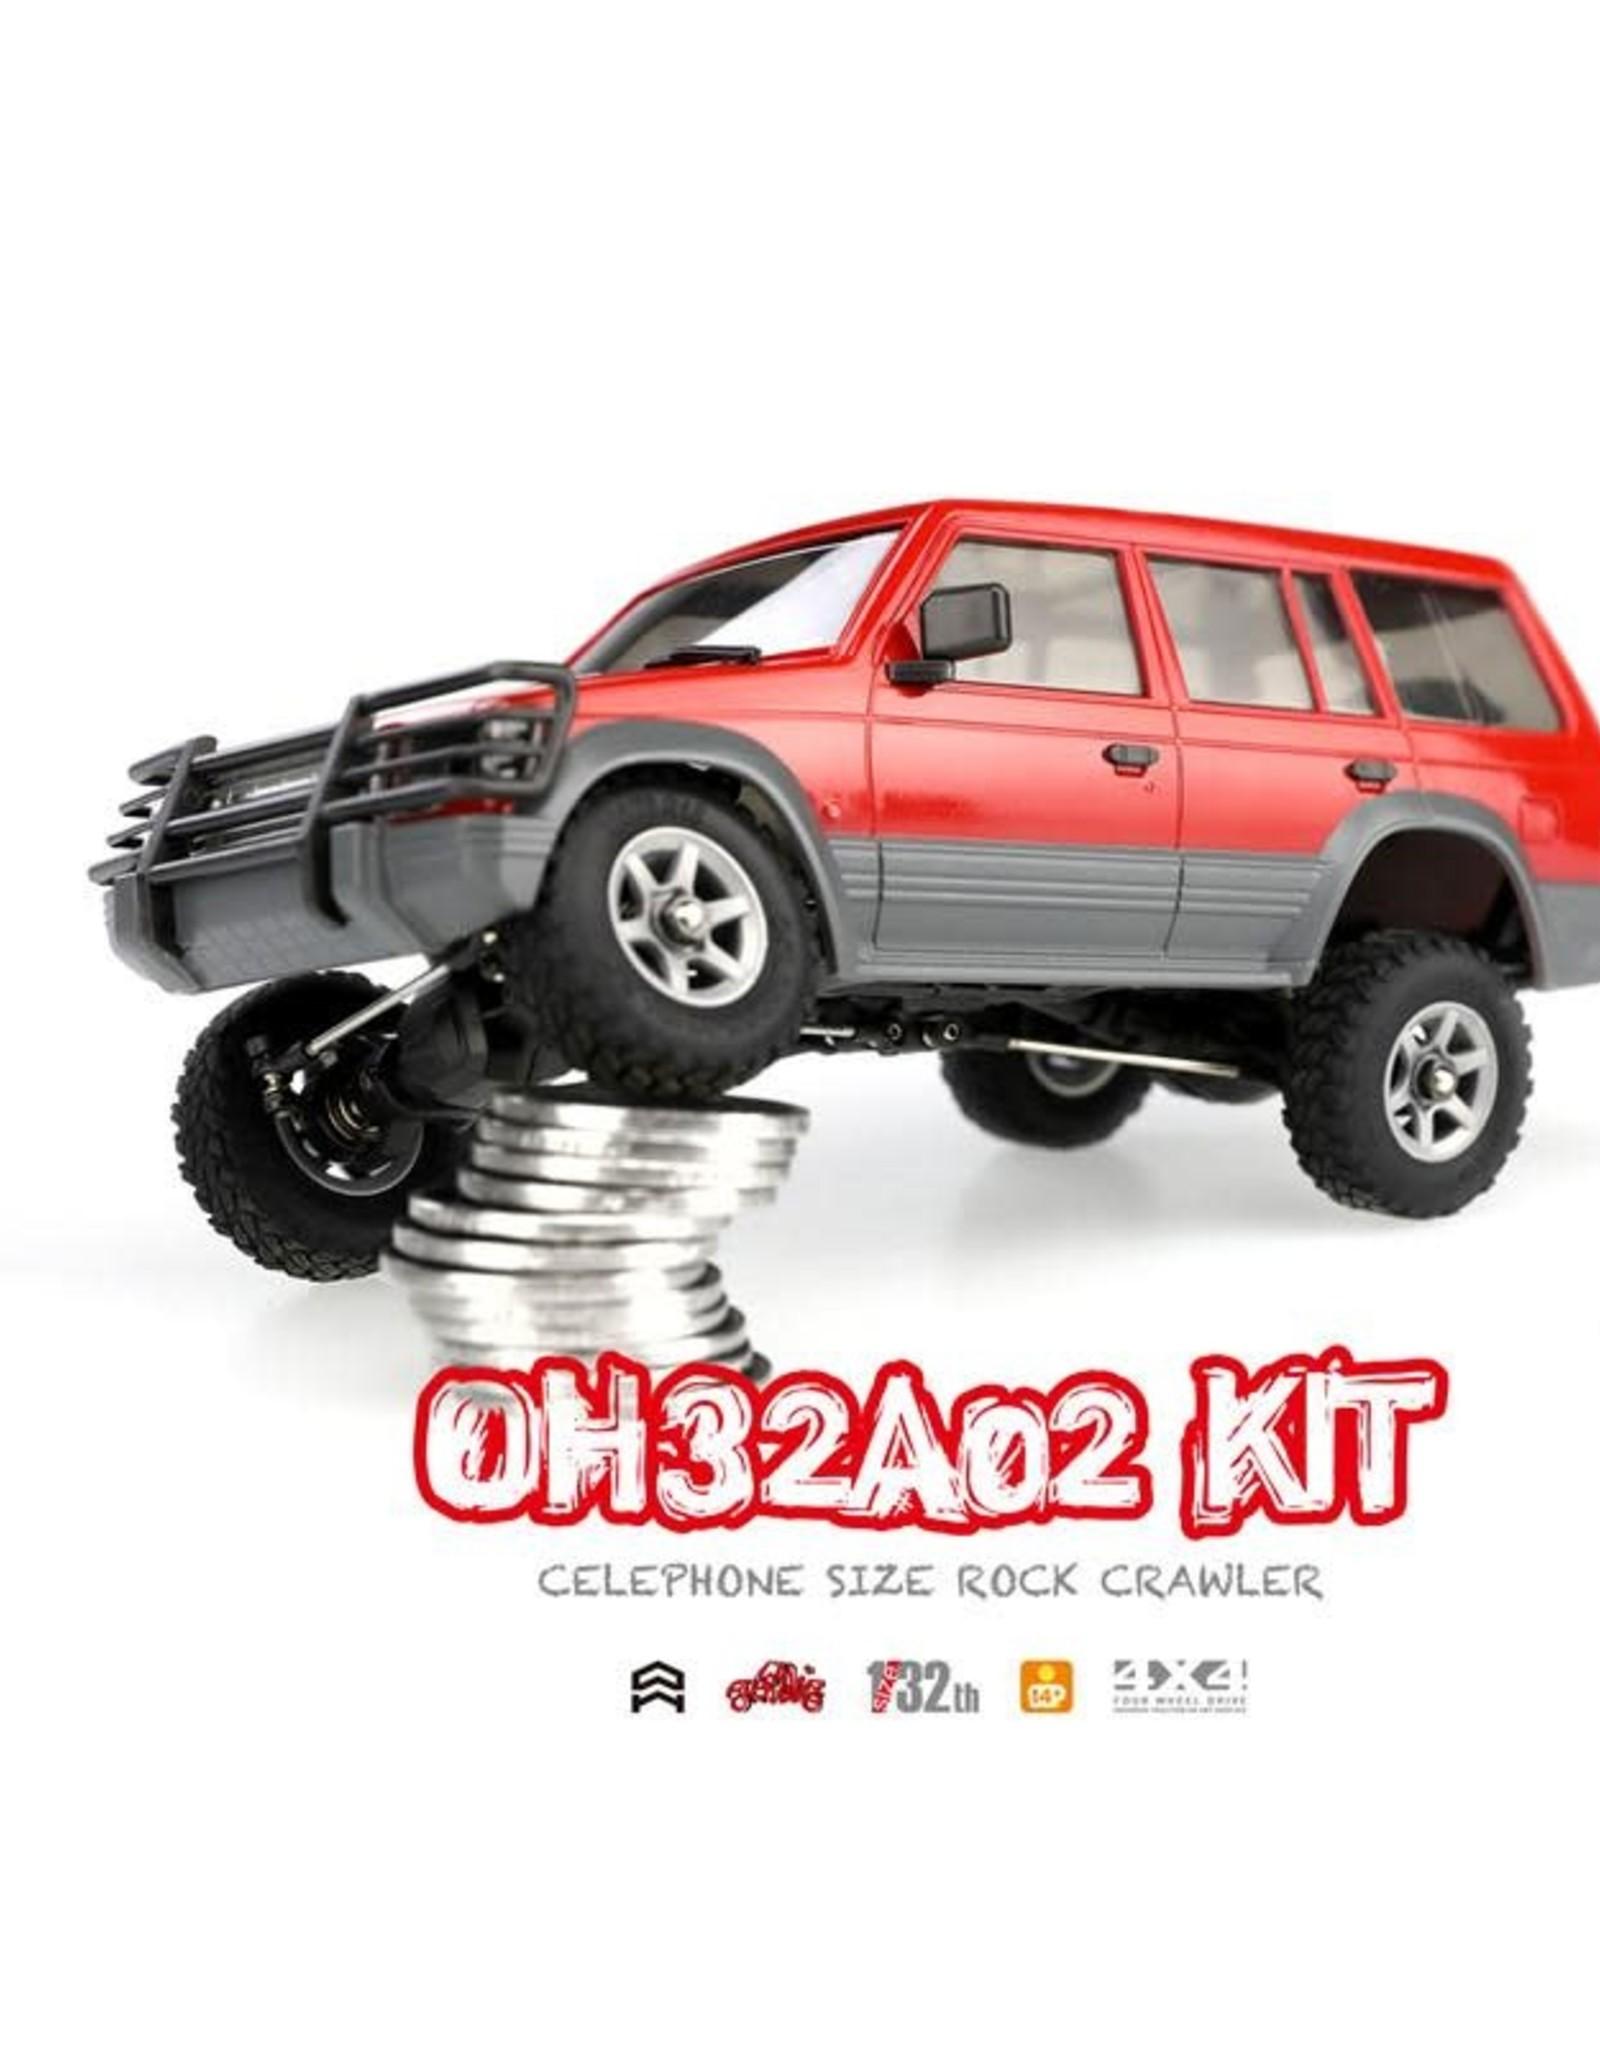 Orlandoo Orlandoo 1/32 4WD DIY RC Car Kit Orlandoo Hunter OH32A02 RC Rock Crawler Without Electronic Parts